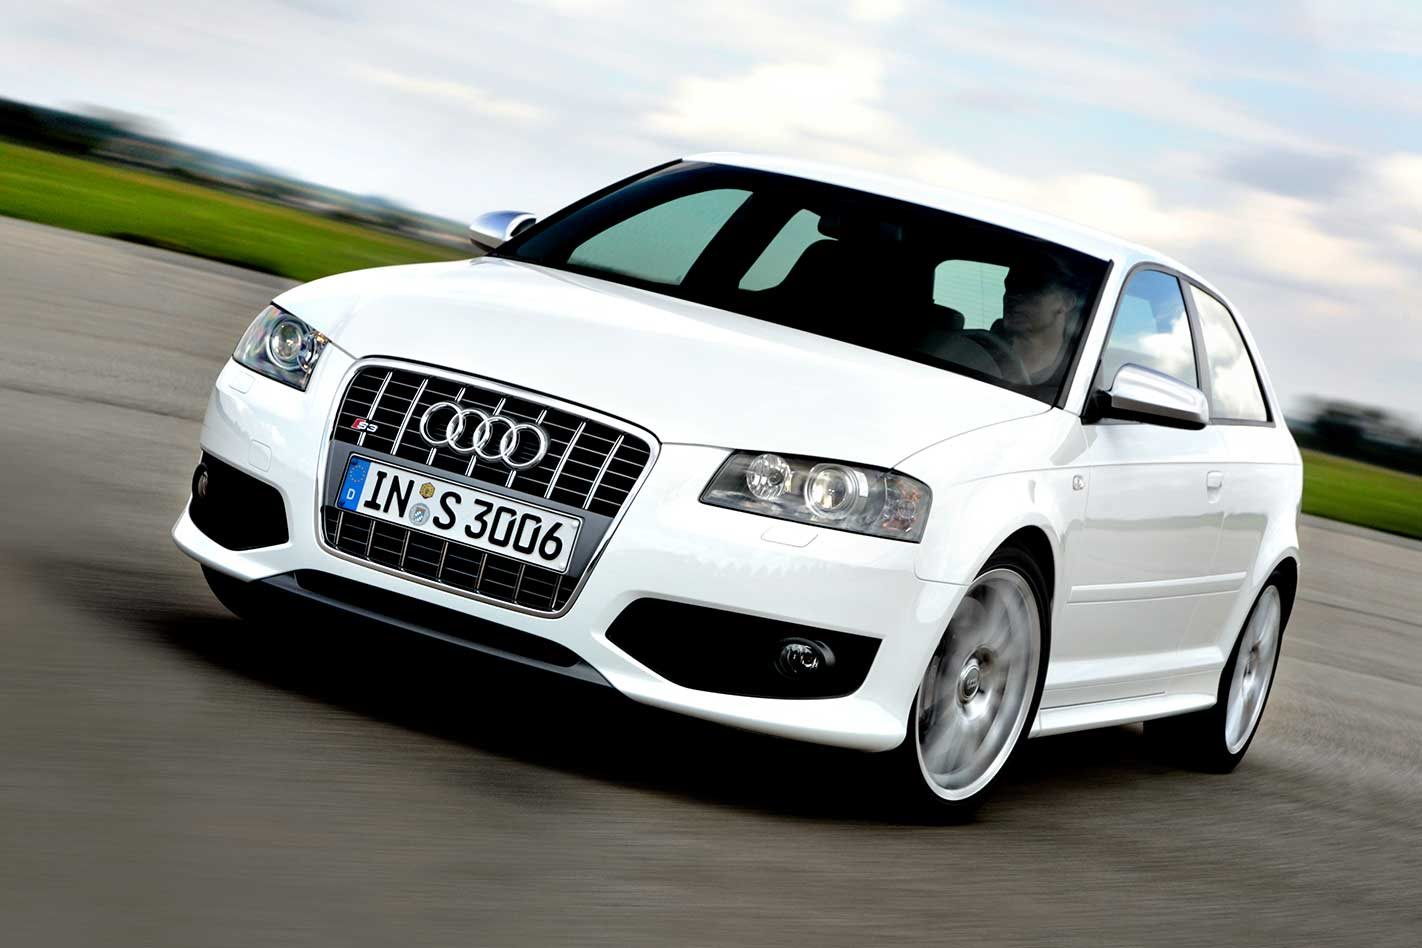 f163a1ba2 2006 Audi S3 review: classic MOTOR